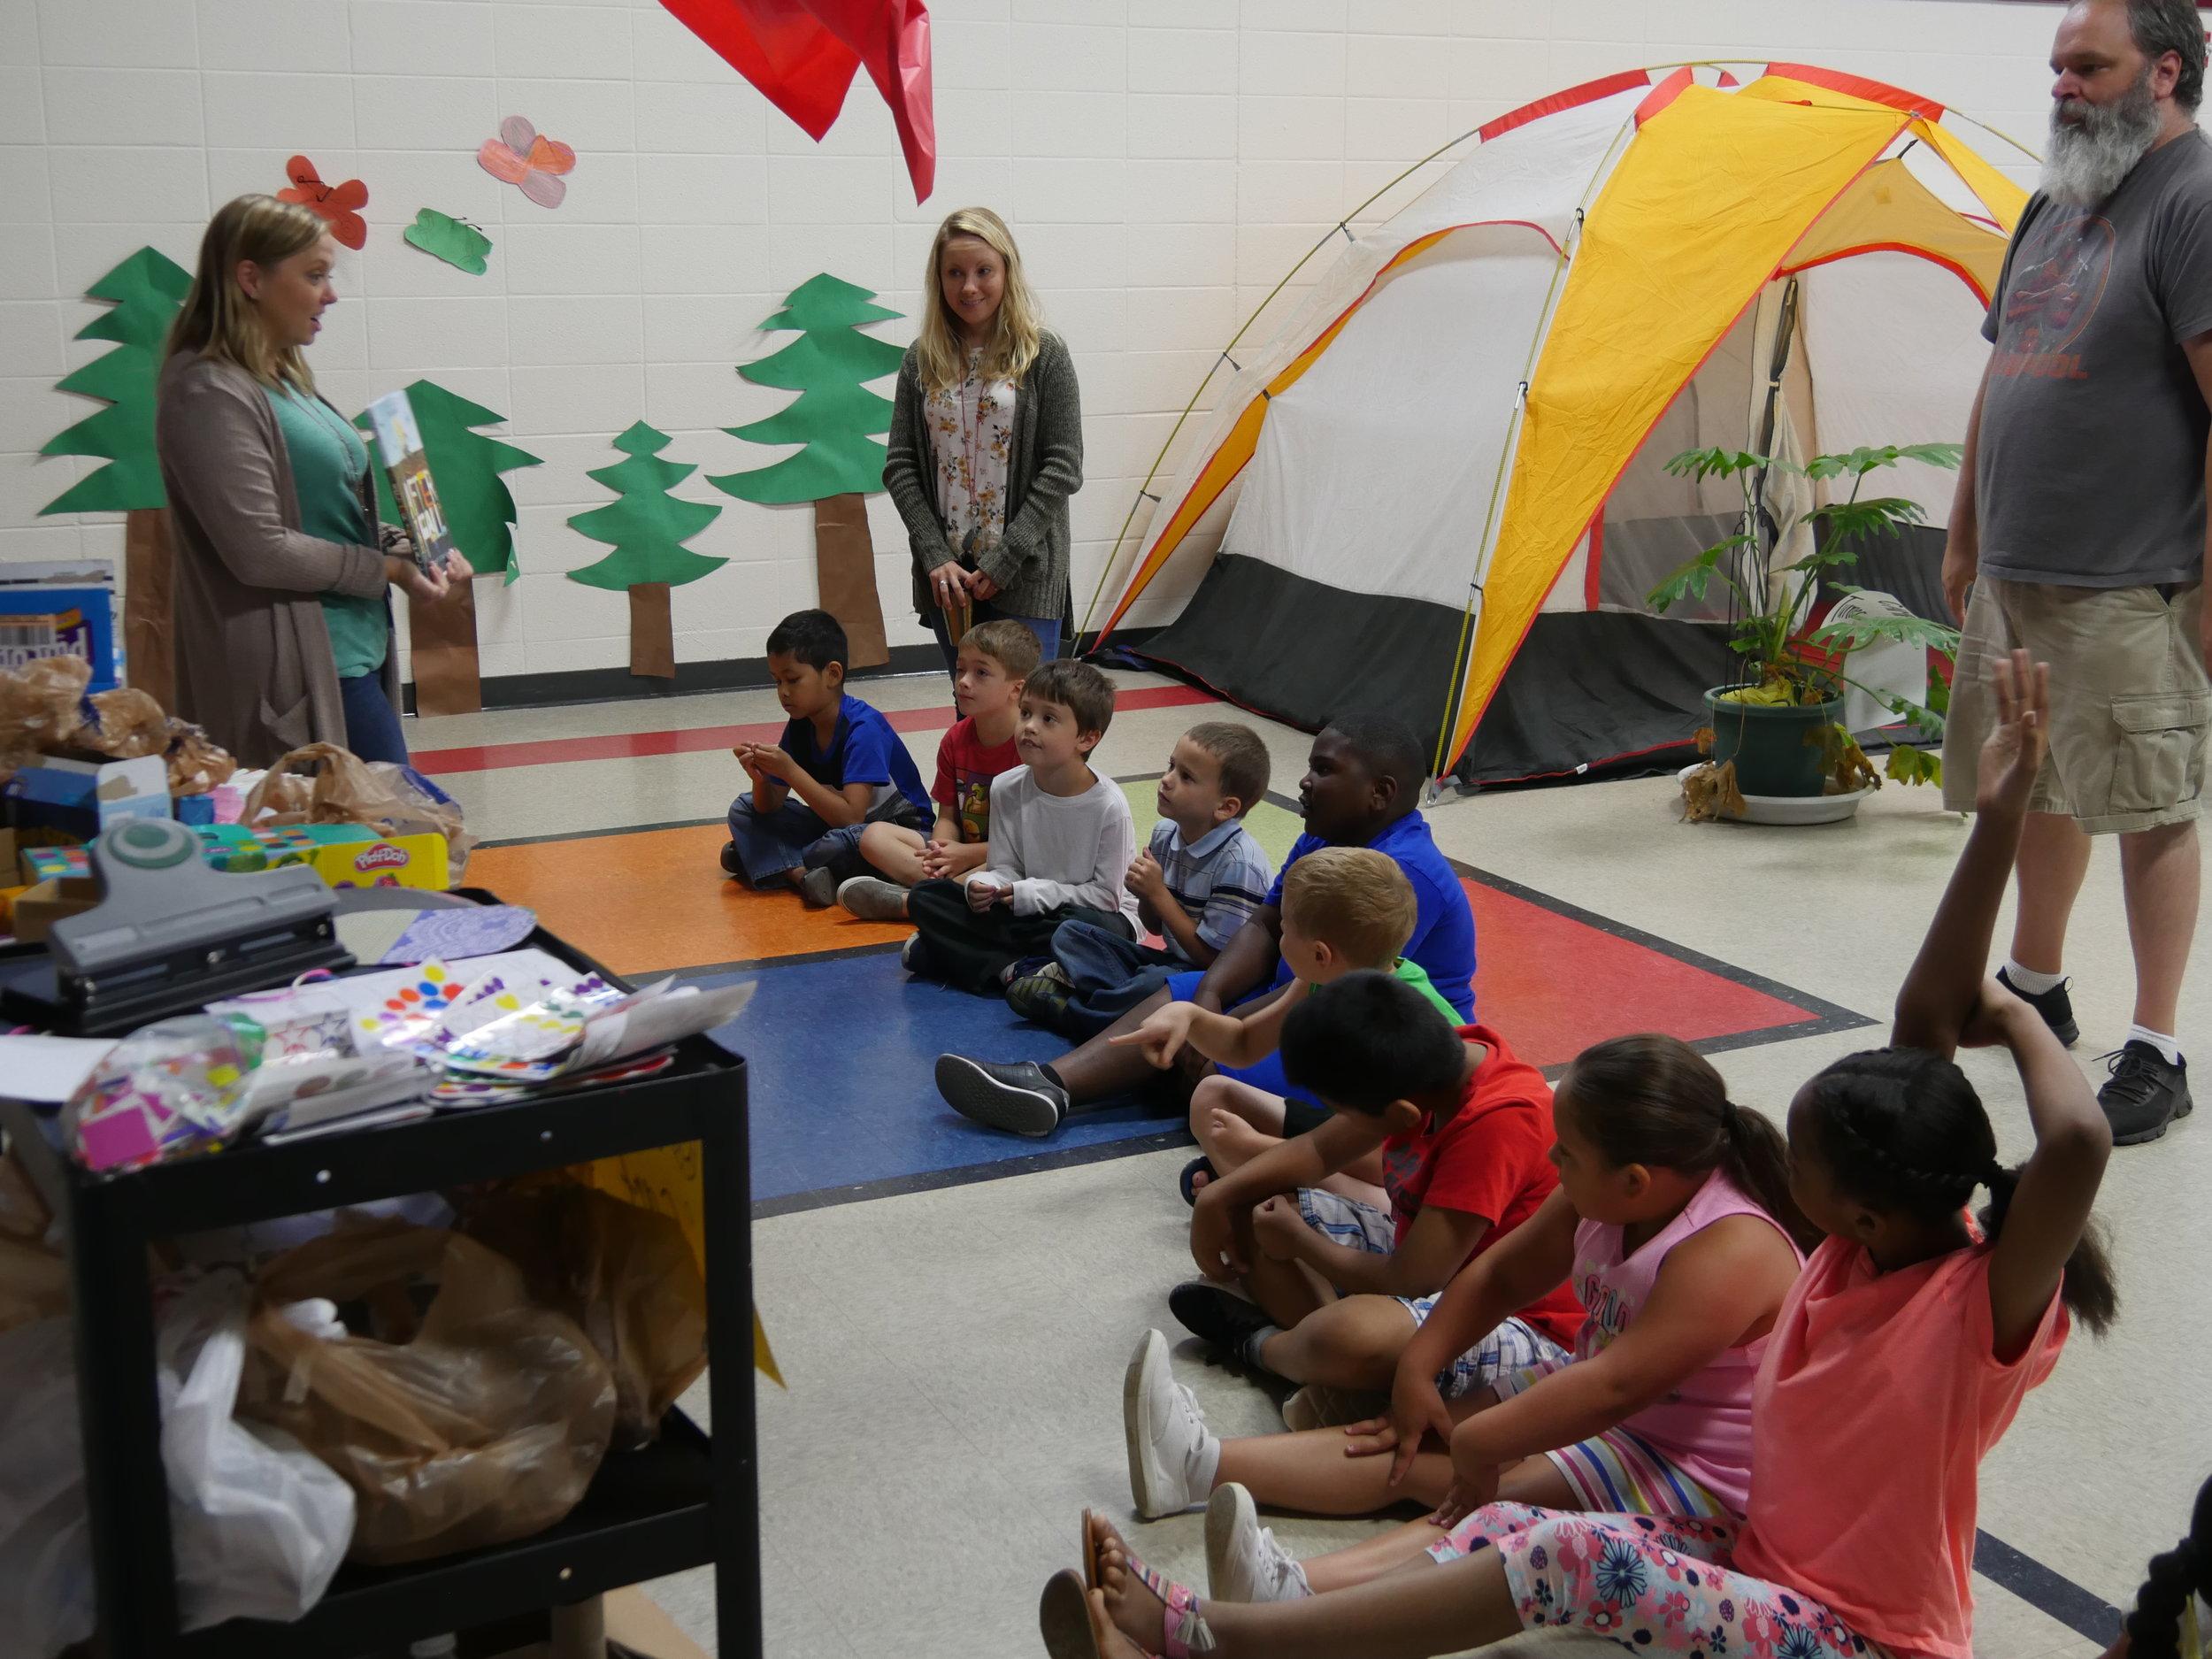 Jere Baxter Students at summer camp